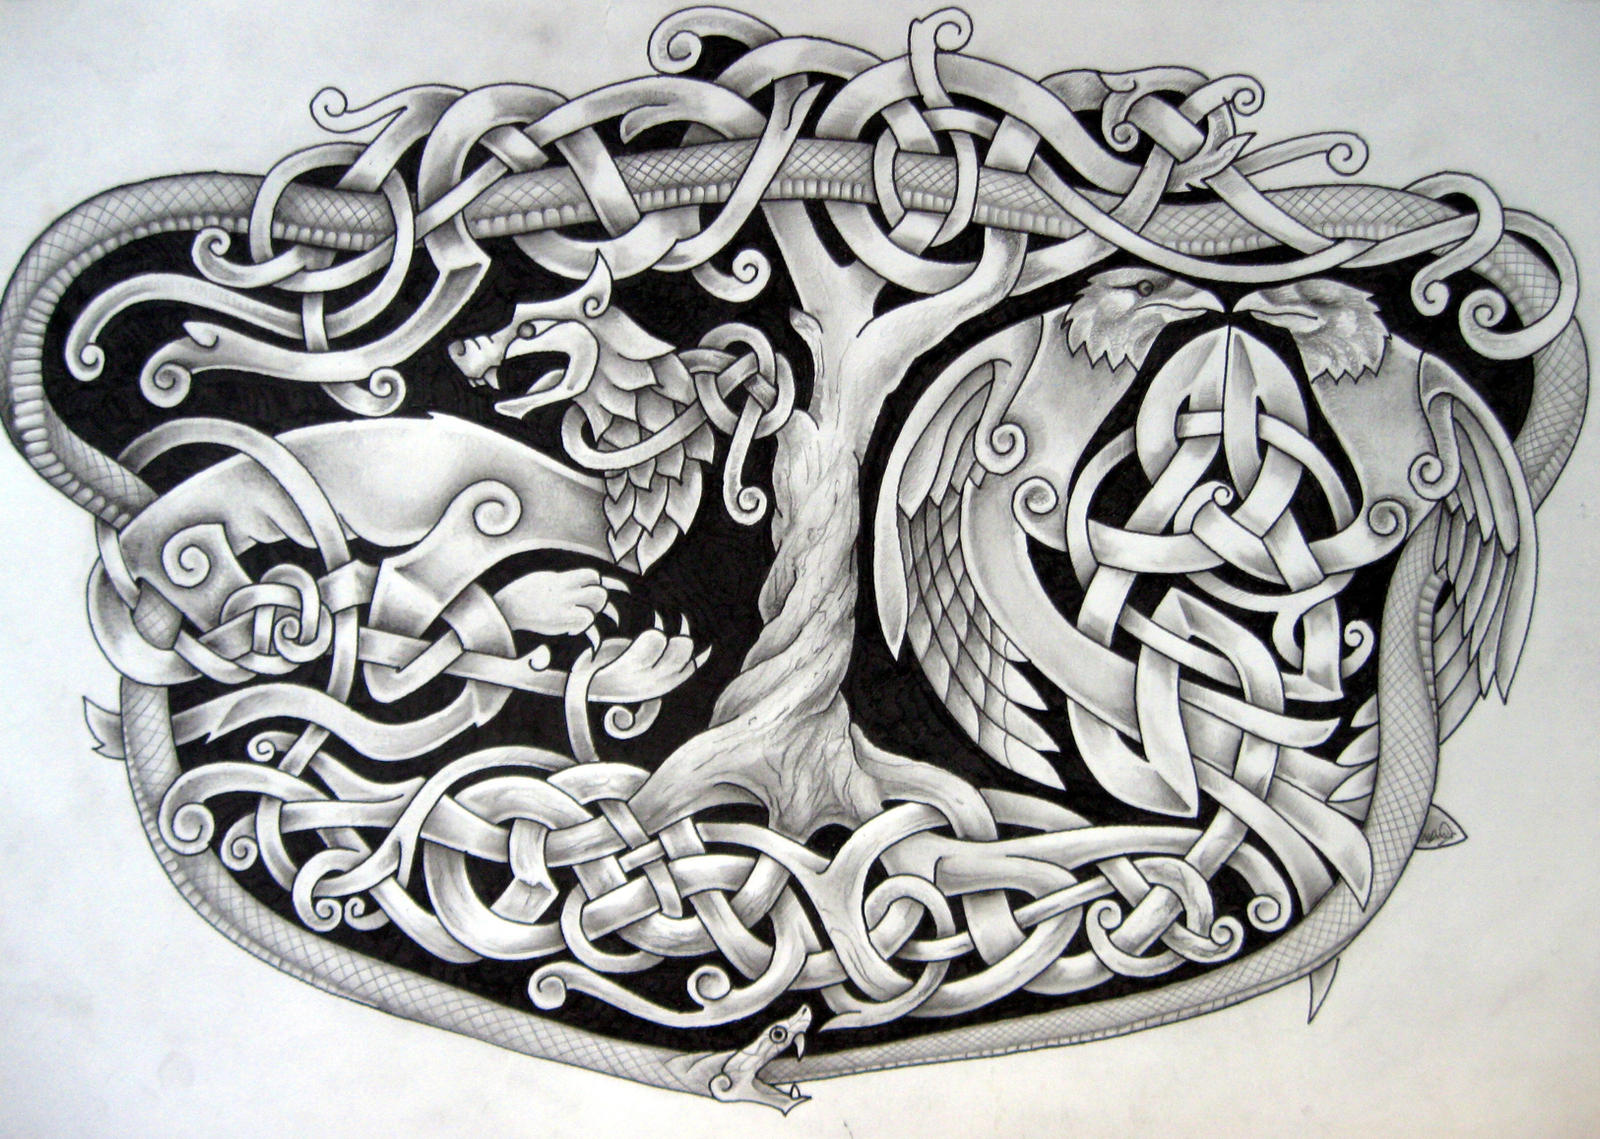 Fenrir Hugin Mugin Jormungandr Yggdrasil by Tattoo-Design